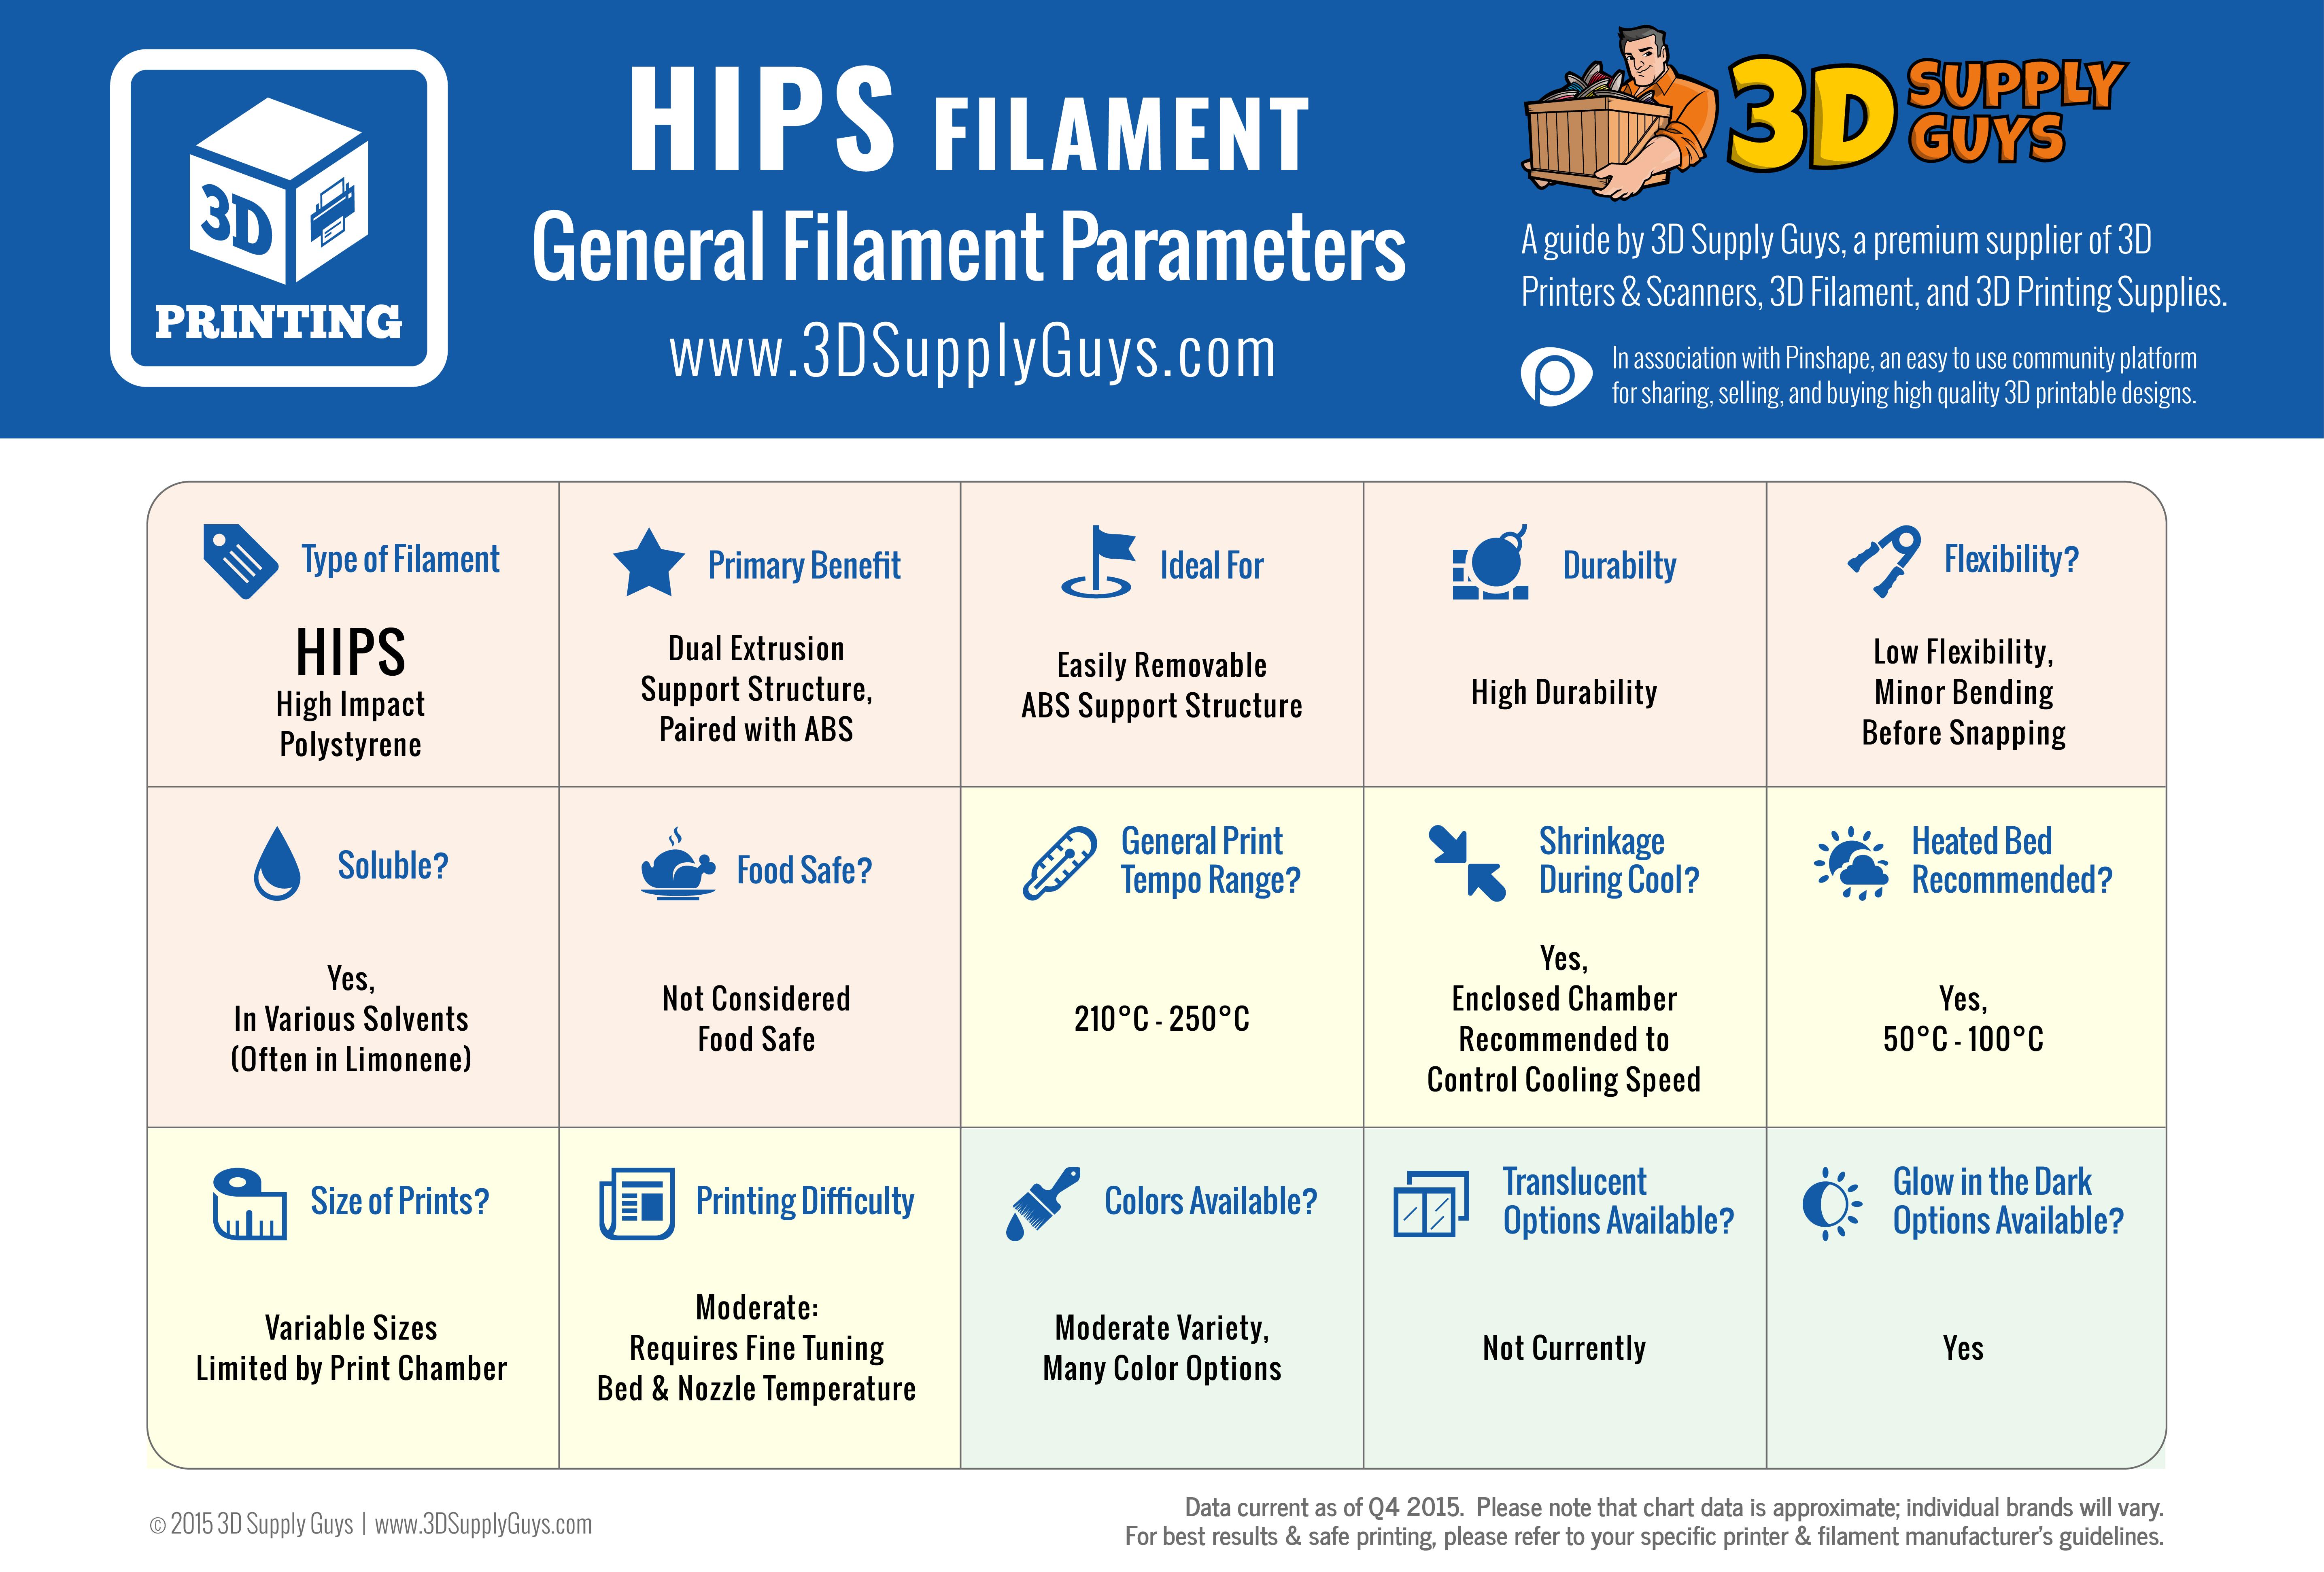 3D printing filament HIPS